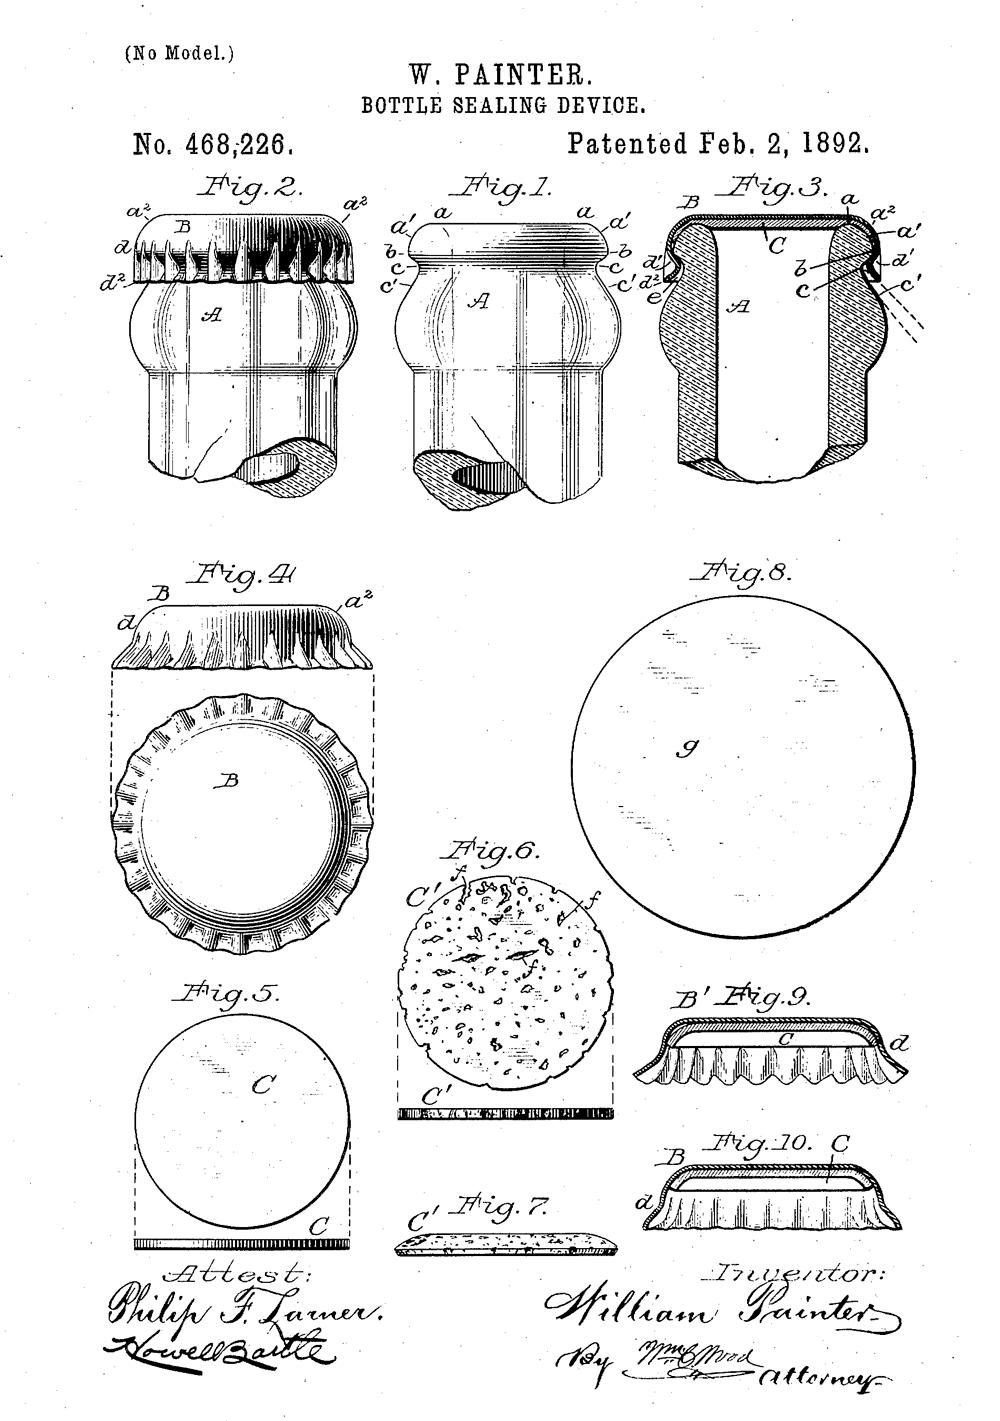 Ilustracja patentu Wiliama Paintera nauszczelkę dokapsla